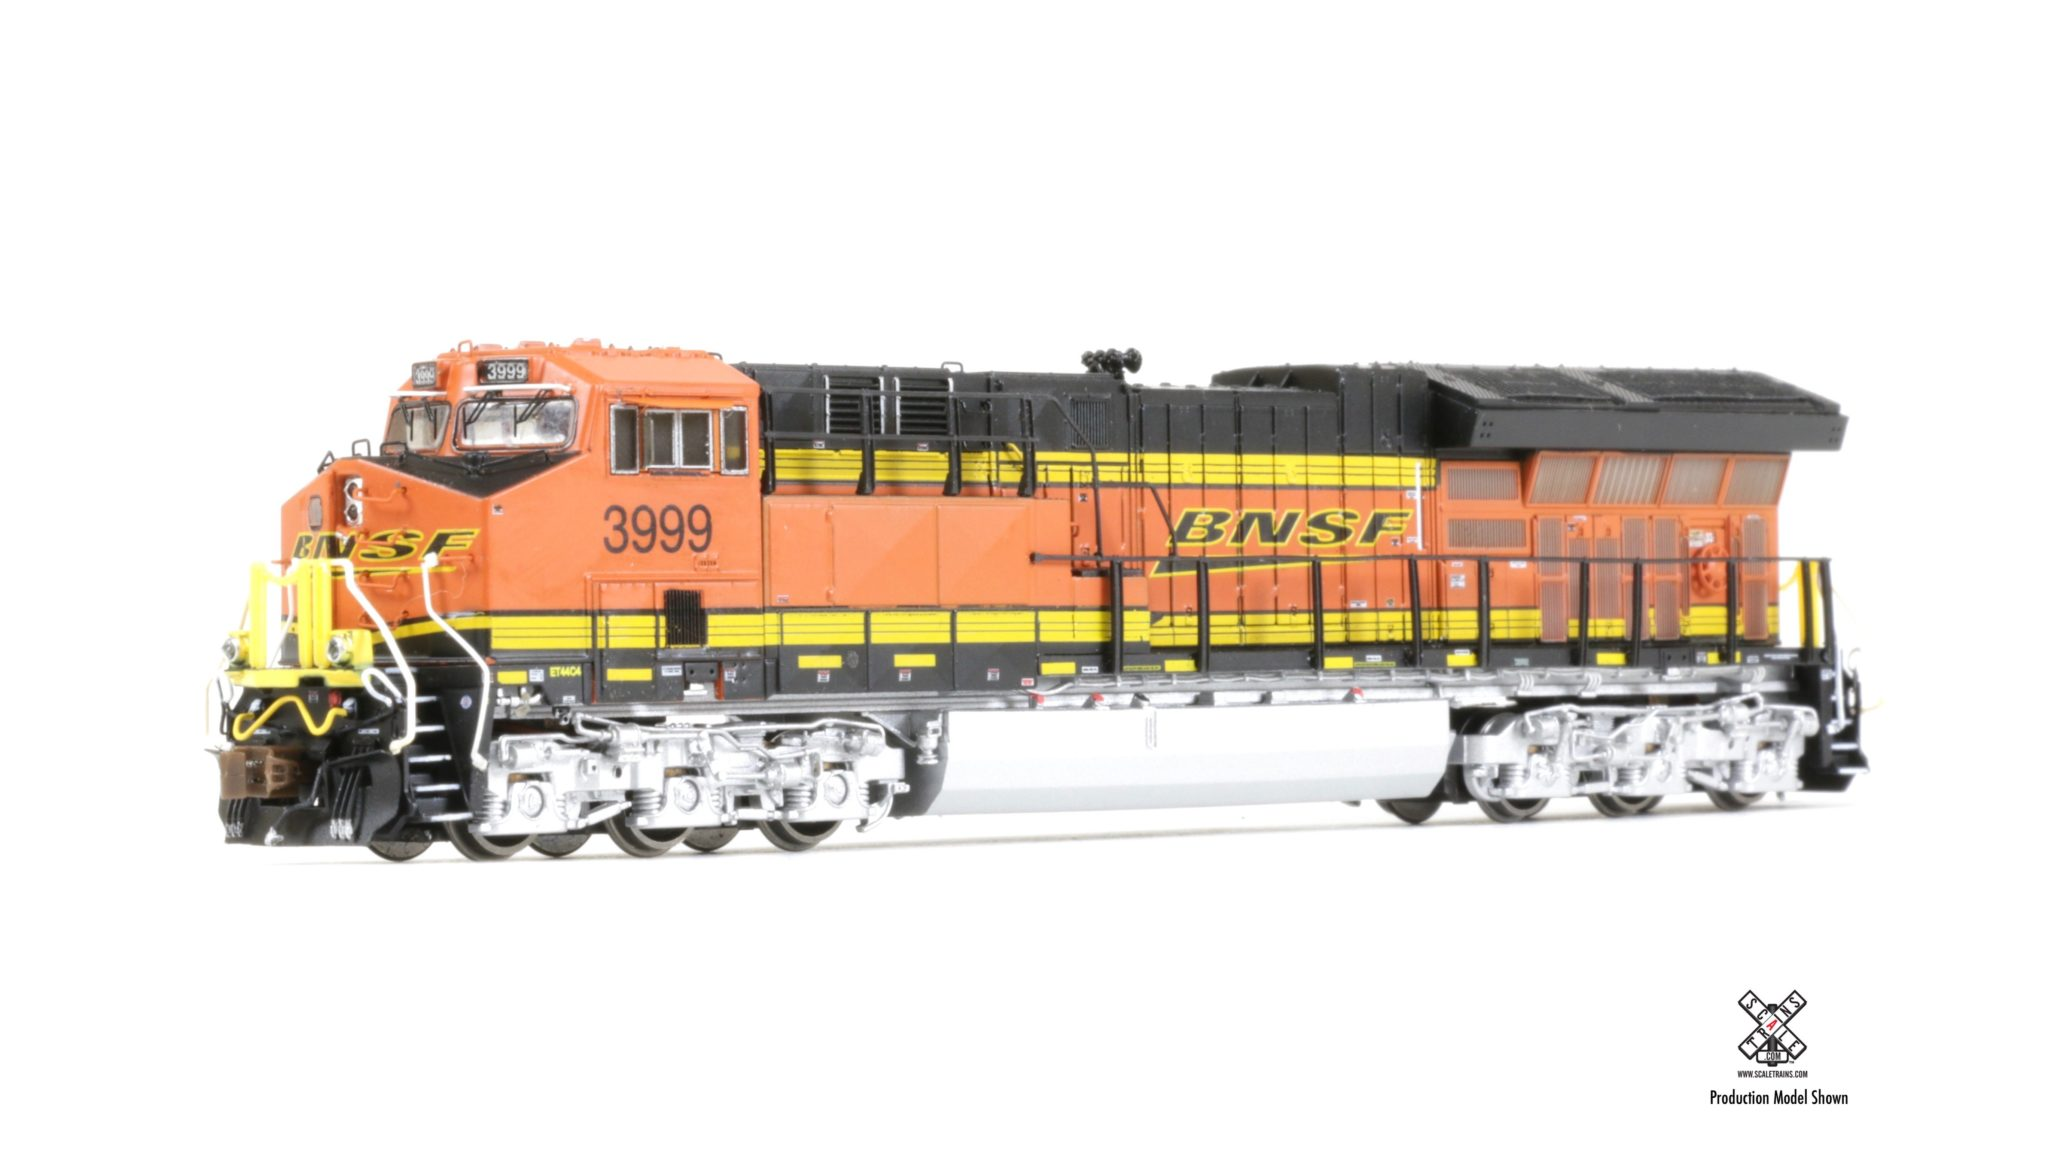 N Scale - ScaleTrains.com - SXT30614 - Locomotive, Diesel, GE GEVO - Burlington Northern Santa Fe - 3999